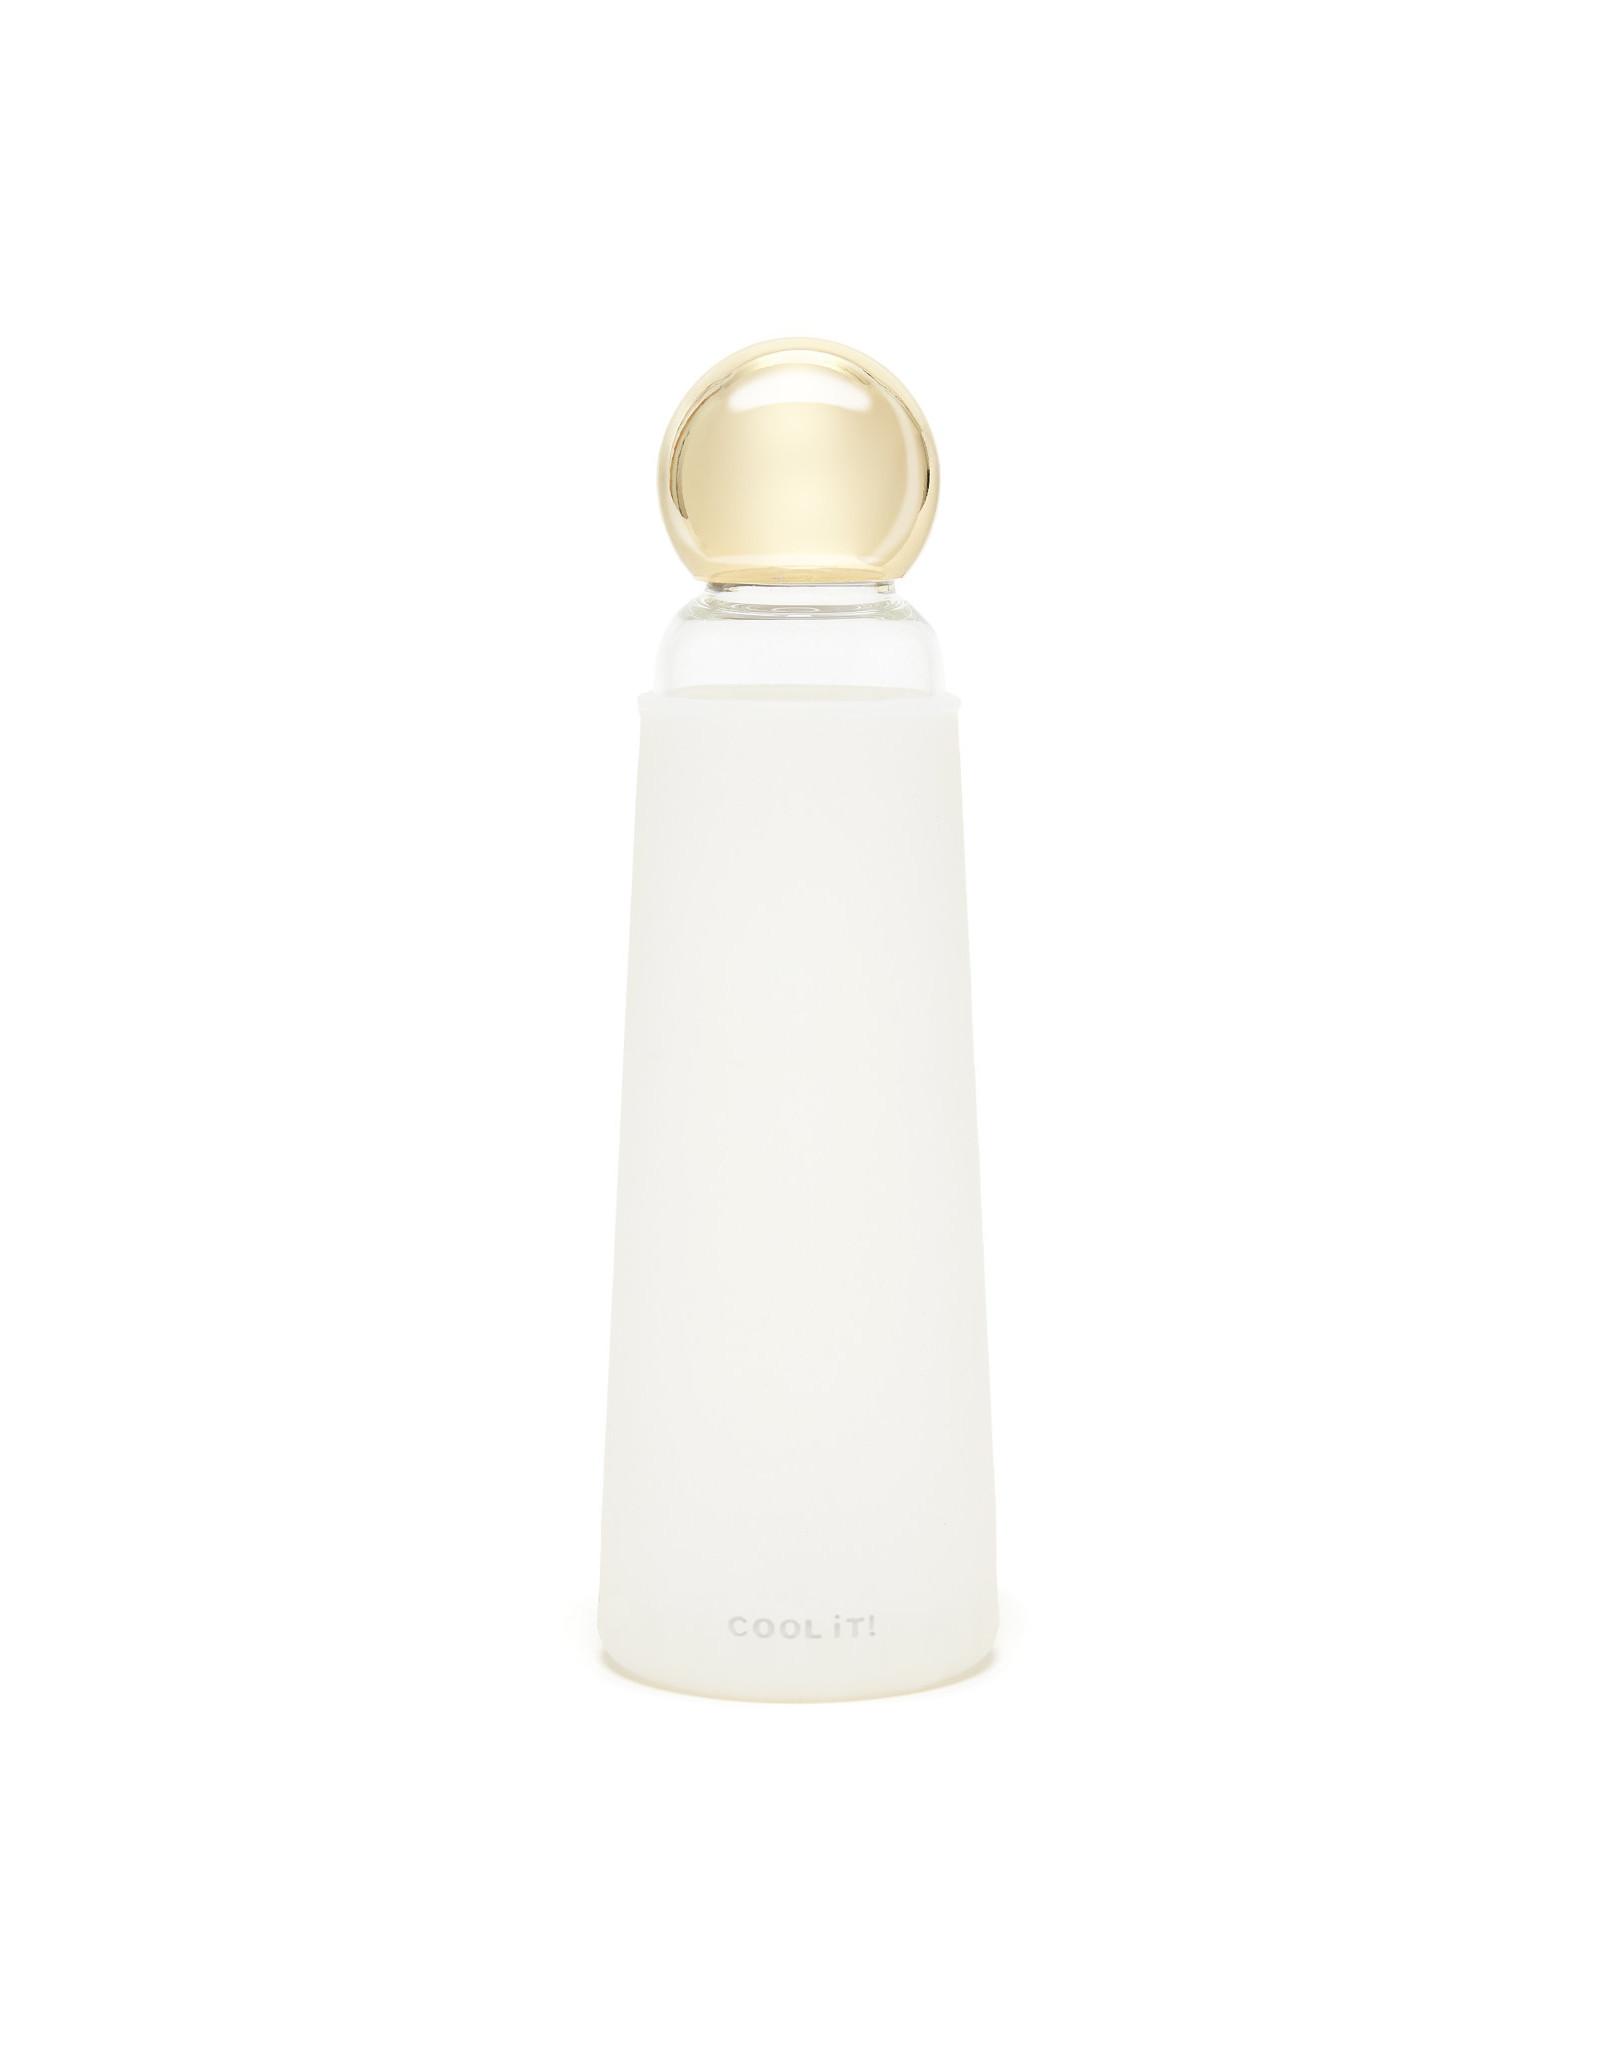 ban.do Glass Water Bottle